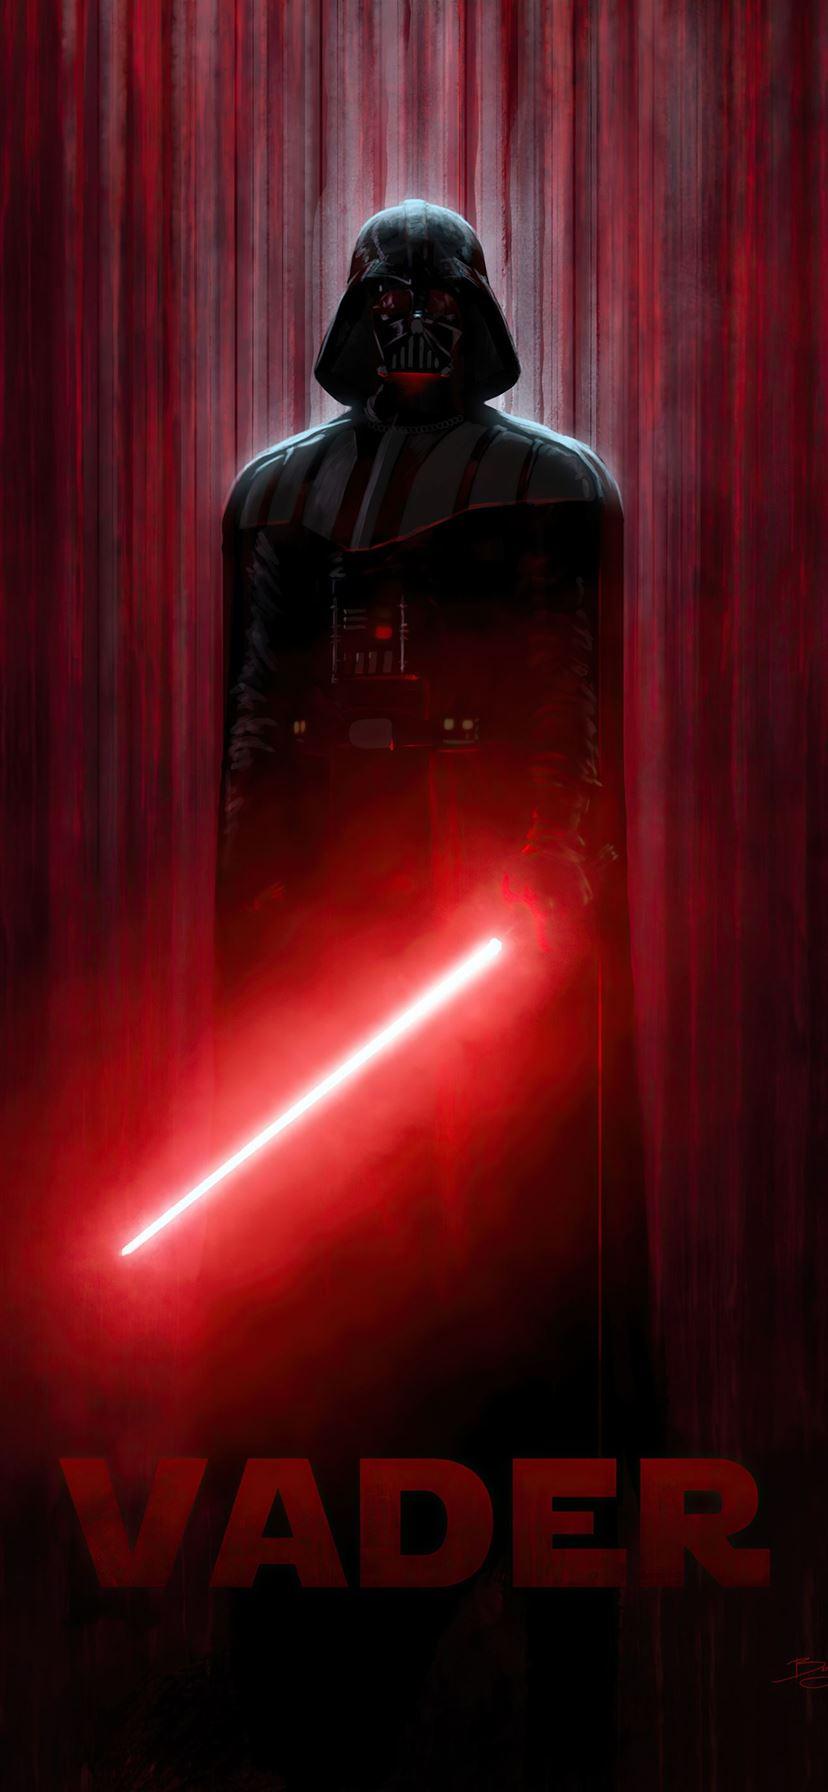 Best Star Wars Iphone 11 Hd Wallpapers Ilikewallpaper